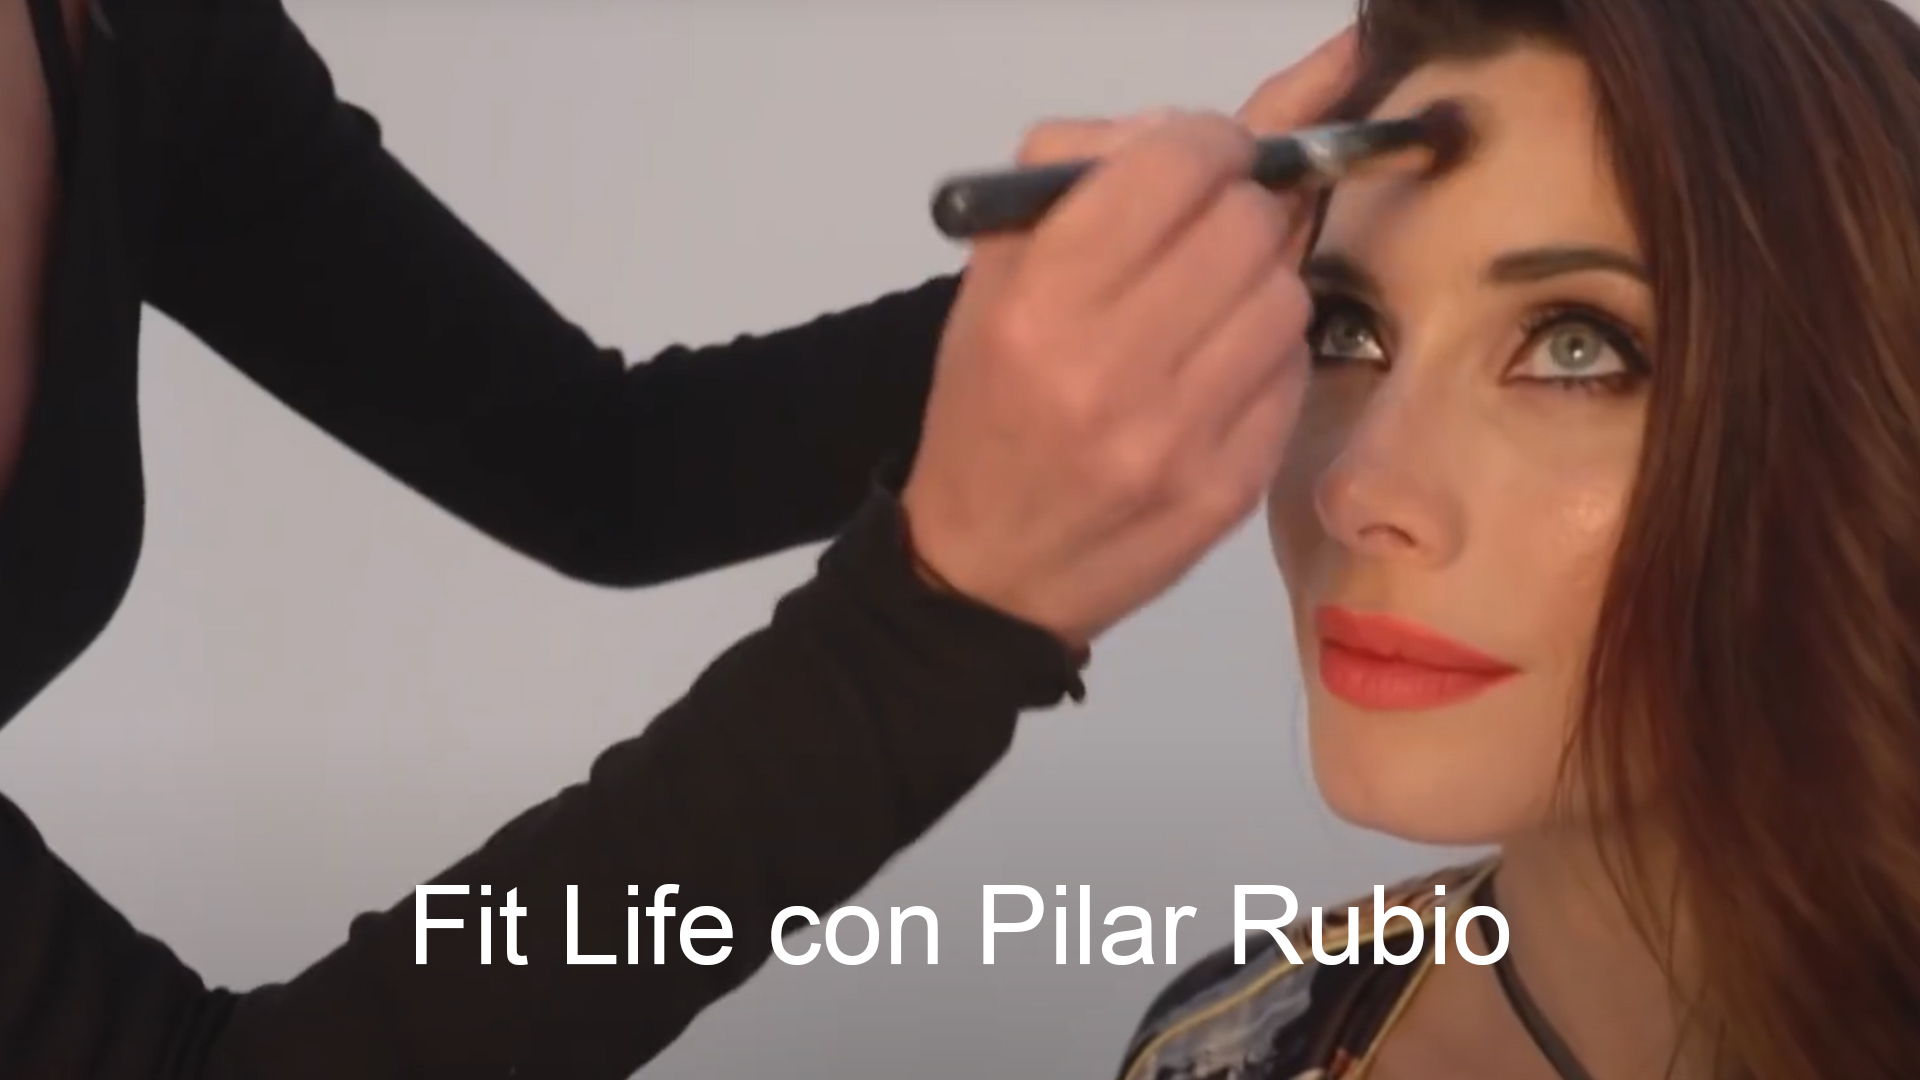 Fit Life con Pilar Rubio